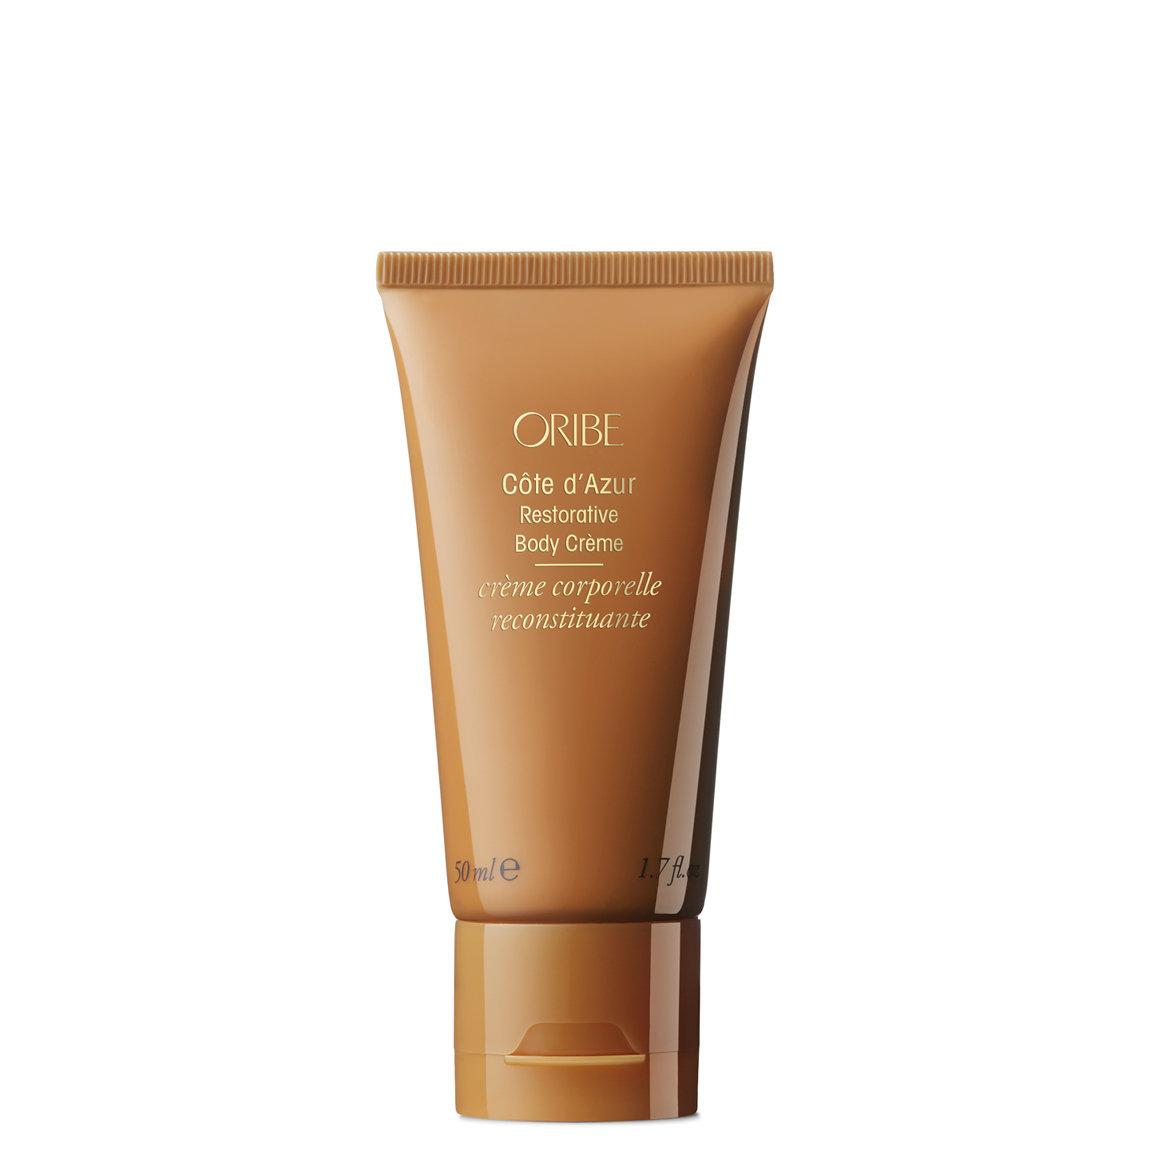 Oribe Côte d'Azur Restorative Body Creme 1.7 oz alternative view 1 - product swatch.